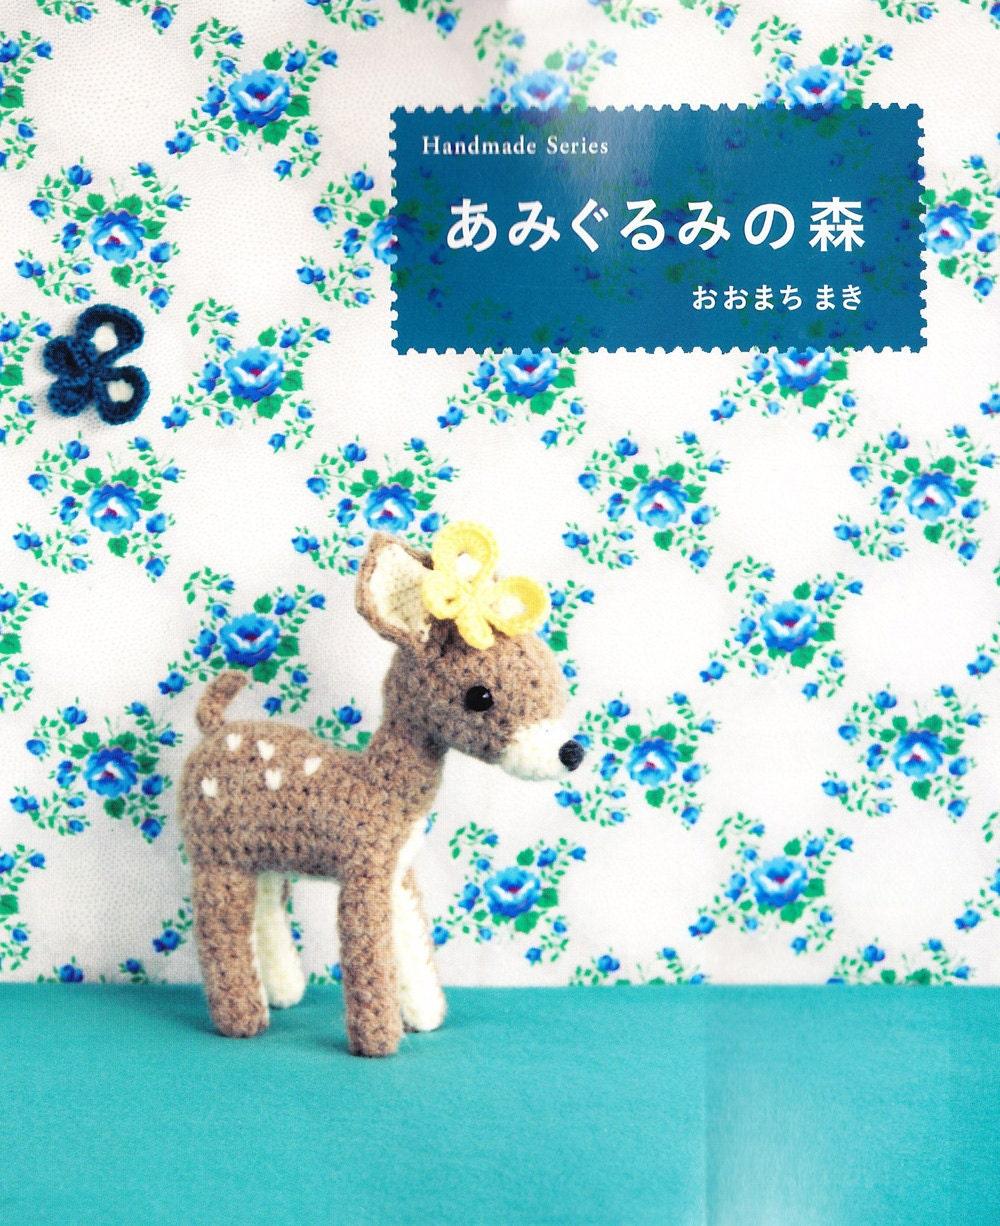 Amigurumi Forest Animals : eBook Amigurumi Forest Animals AMI10 by MyCraftyBook on Etsy